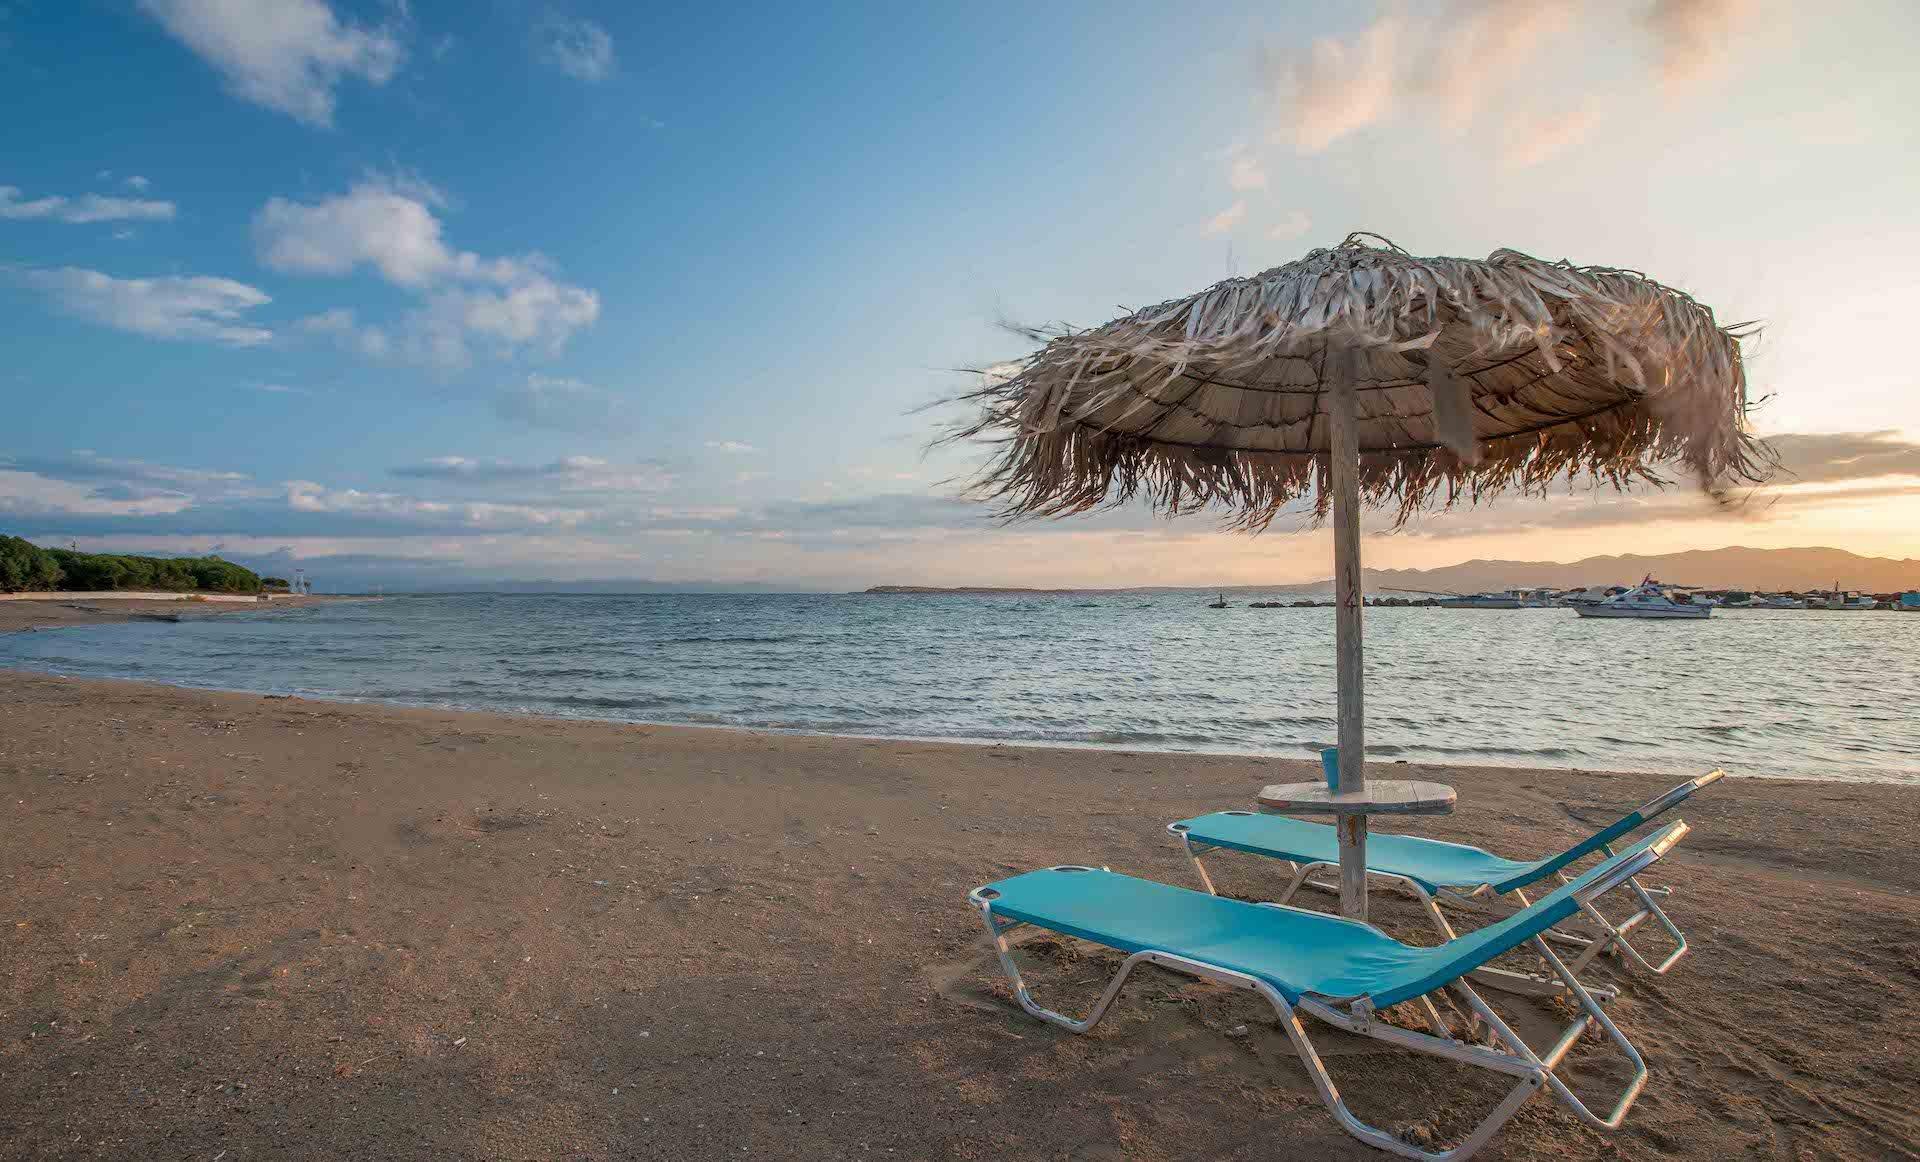 oasis-beach-photo3